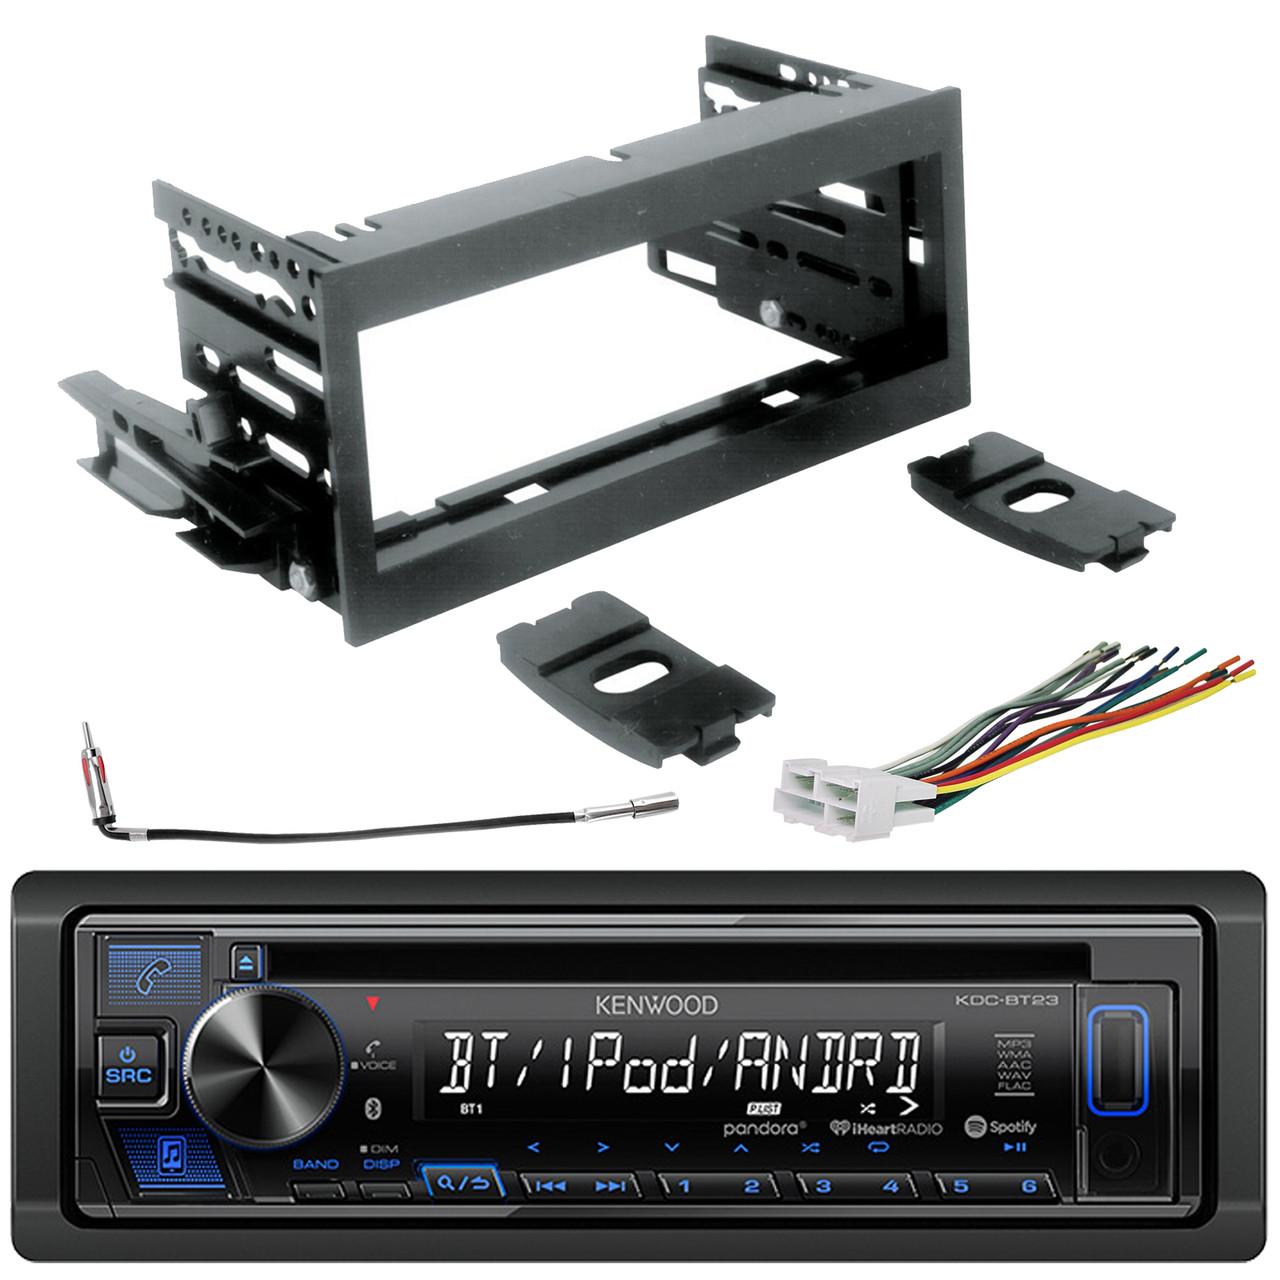 kenwood din usb mp3 cd bluetooth radio w/ scosche kit, harness, antenna  adapter - road entertainment